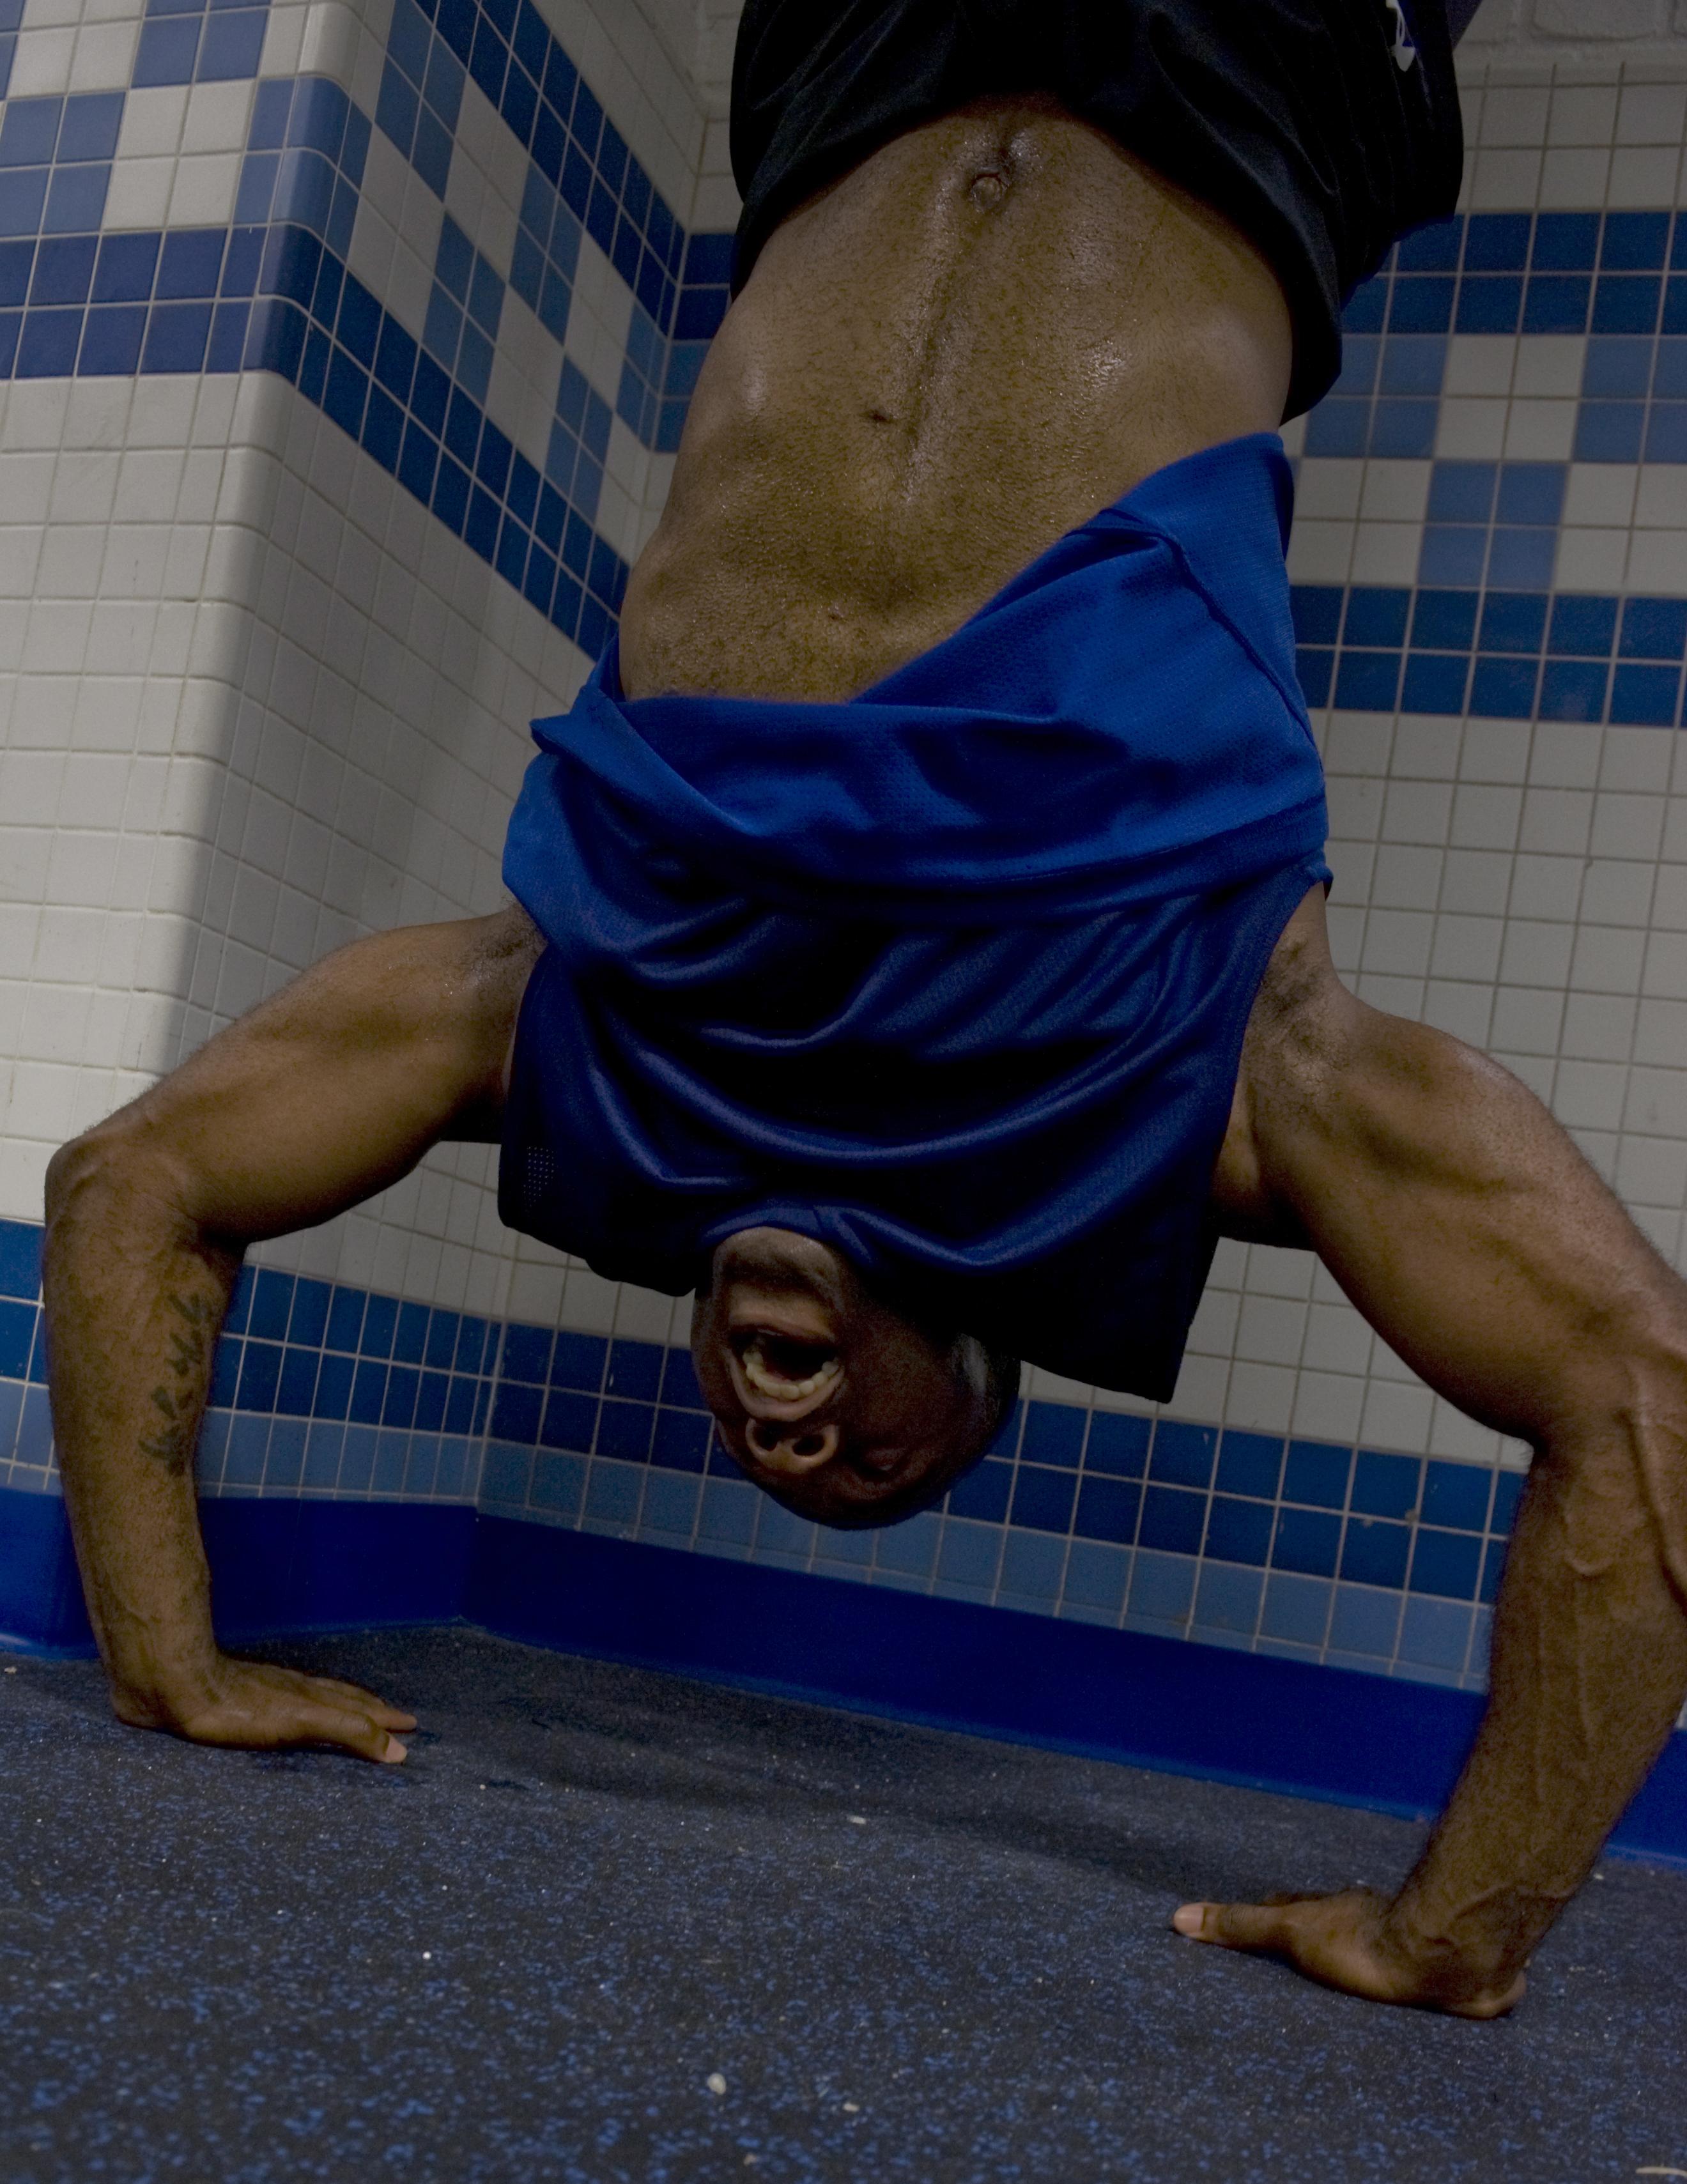 File:Handstand pushup.jpg - 维基百科,自由的百科全书